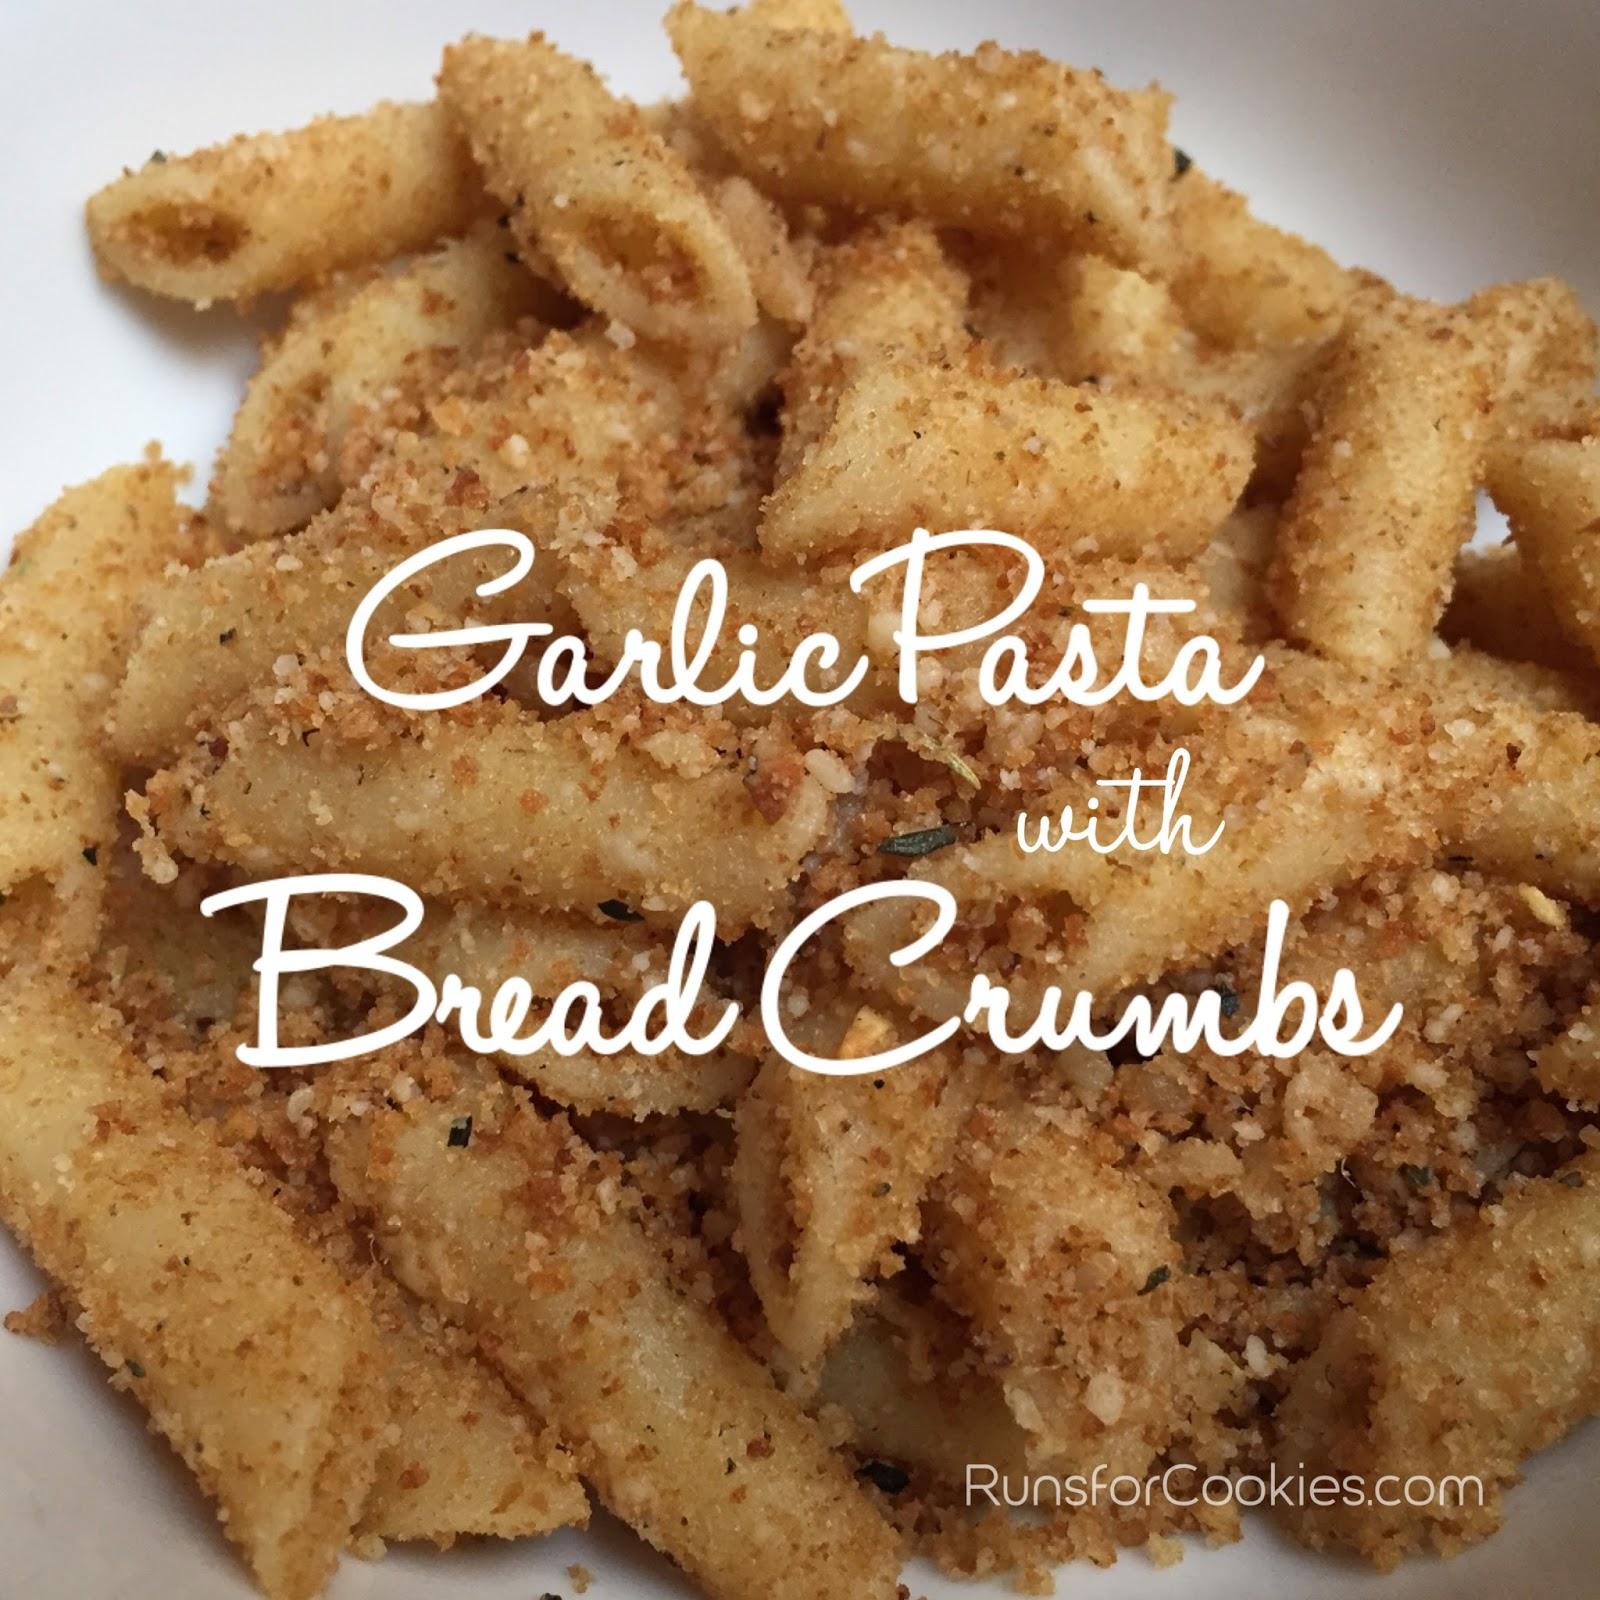 Garlic Pasta recipe